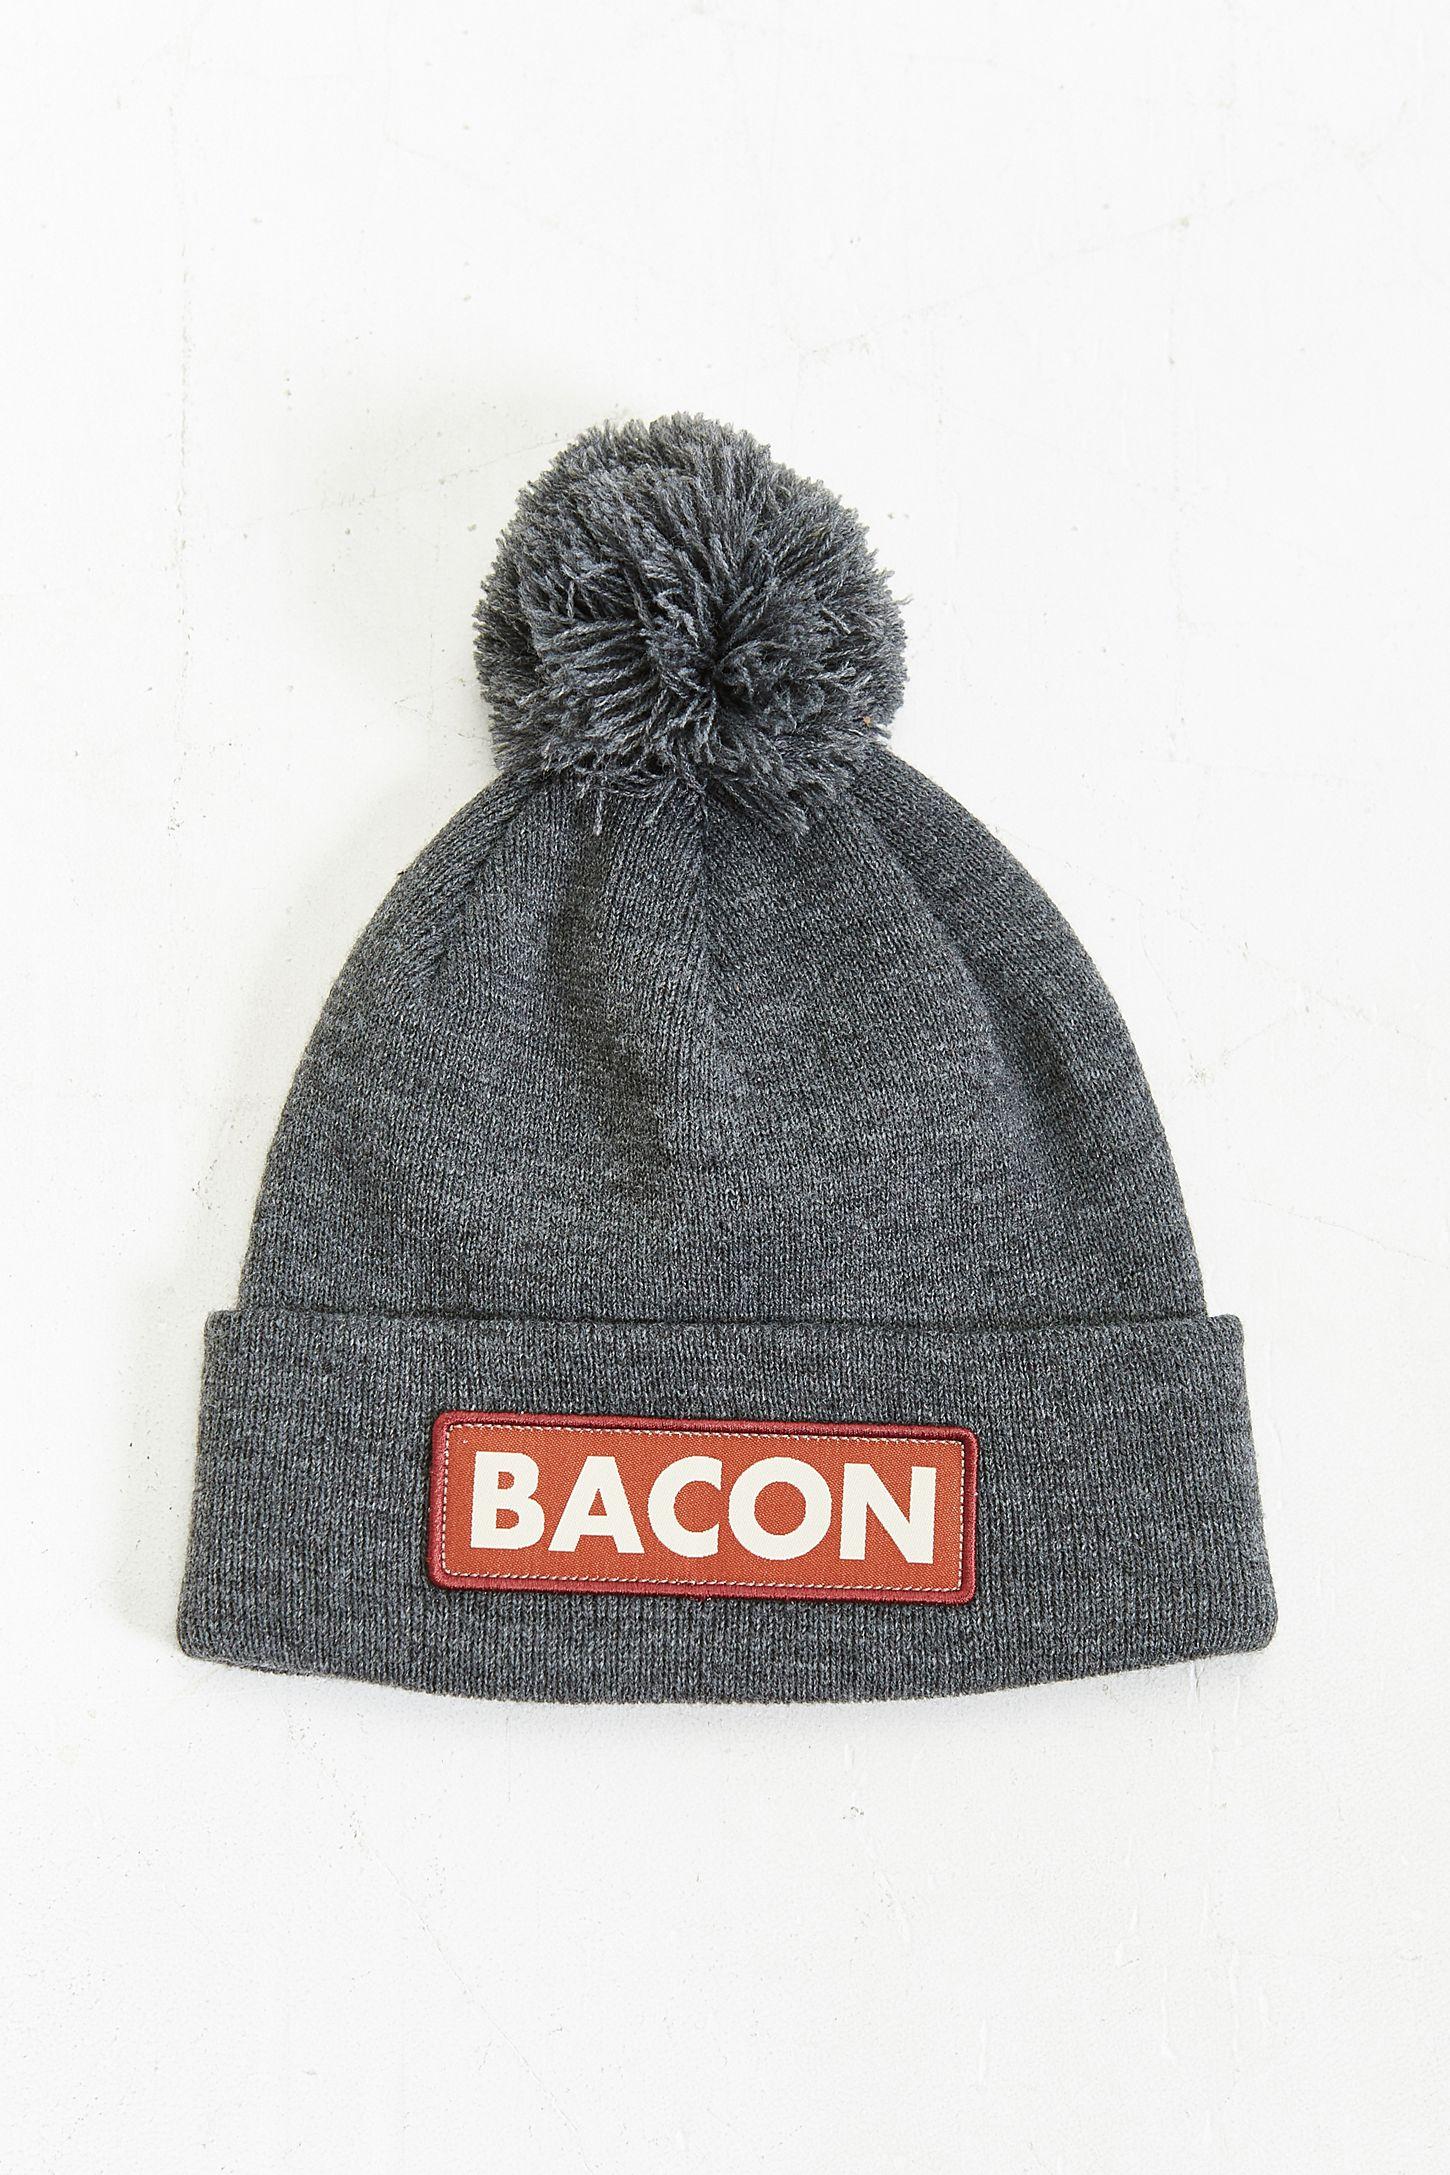 Coal The Vice Bacon Pom Beanie  cd4891eafa9